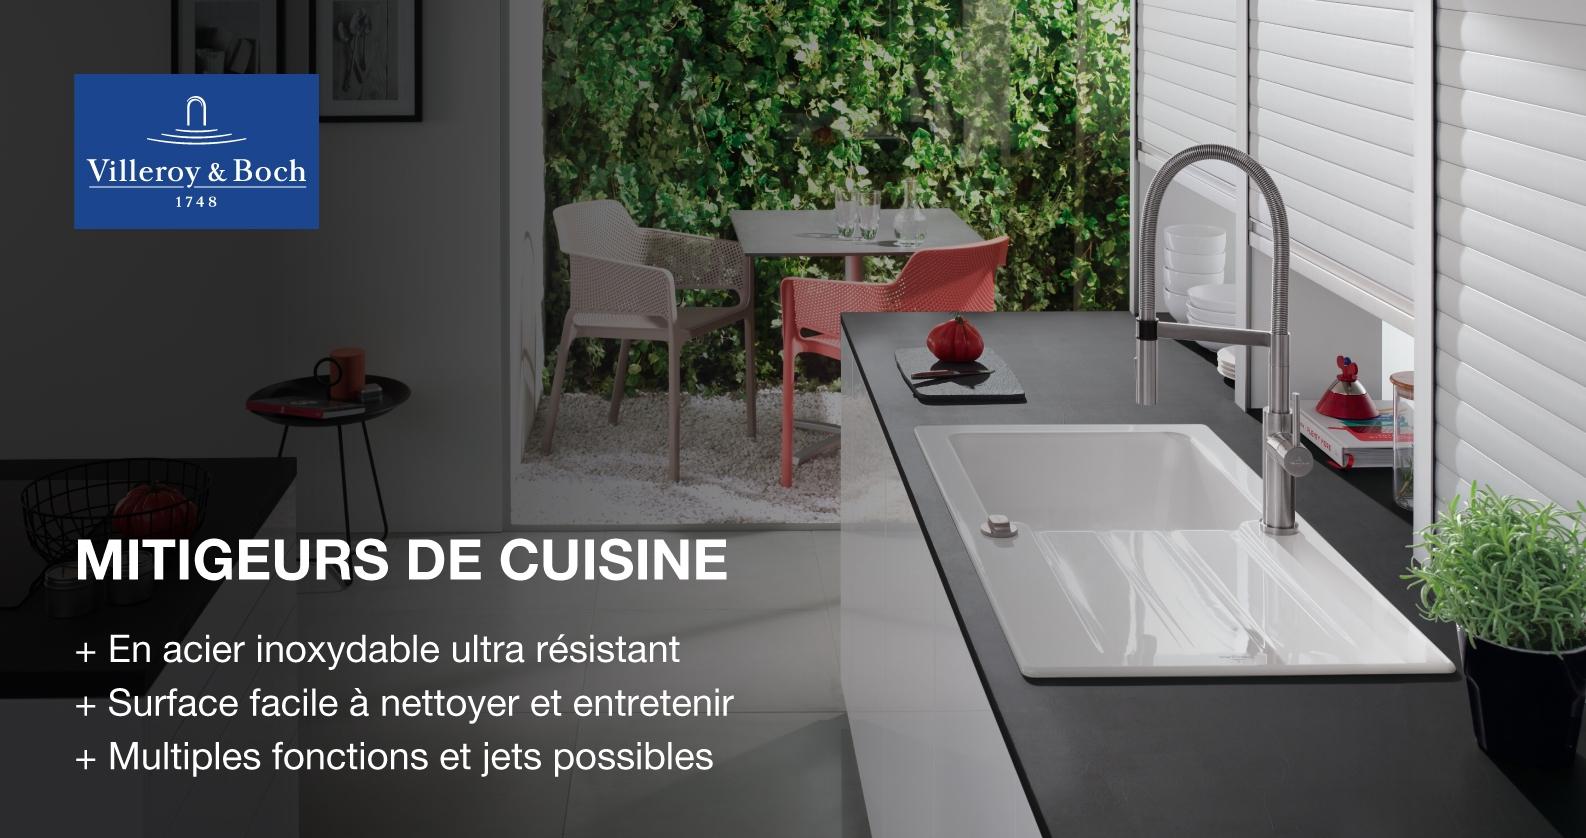 Robinetteries de cuisine Villeroy & Boch